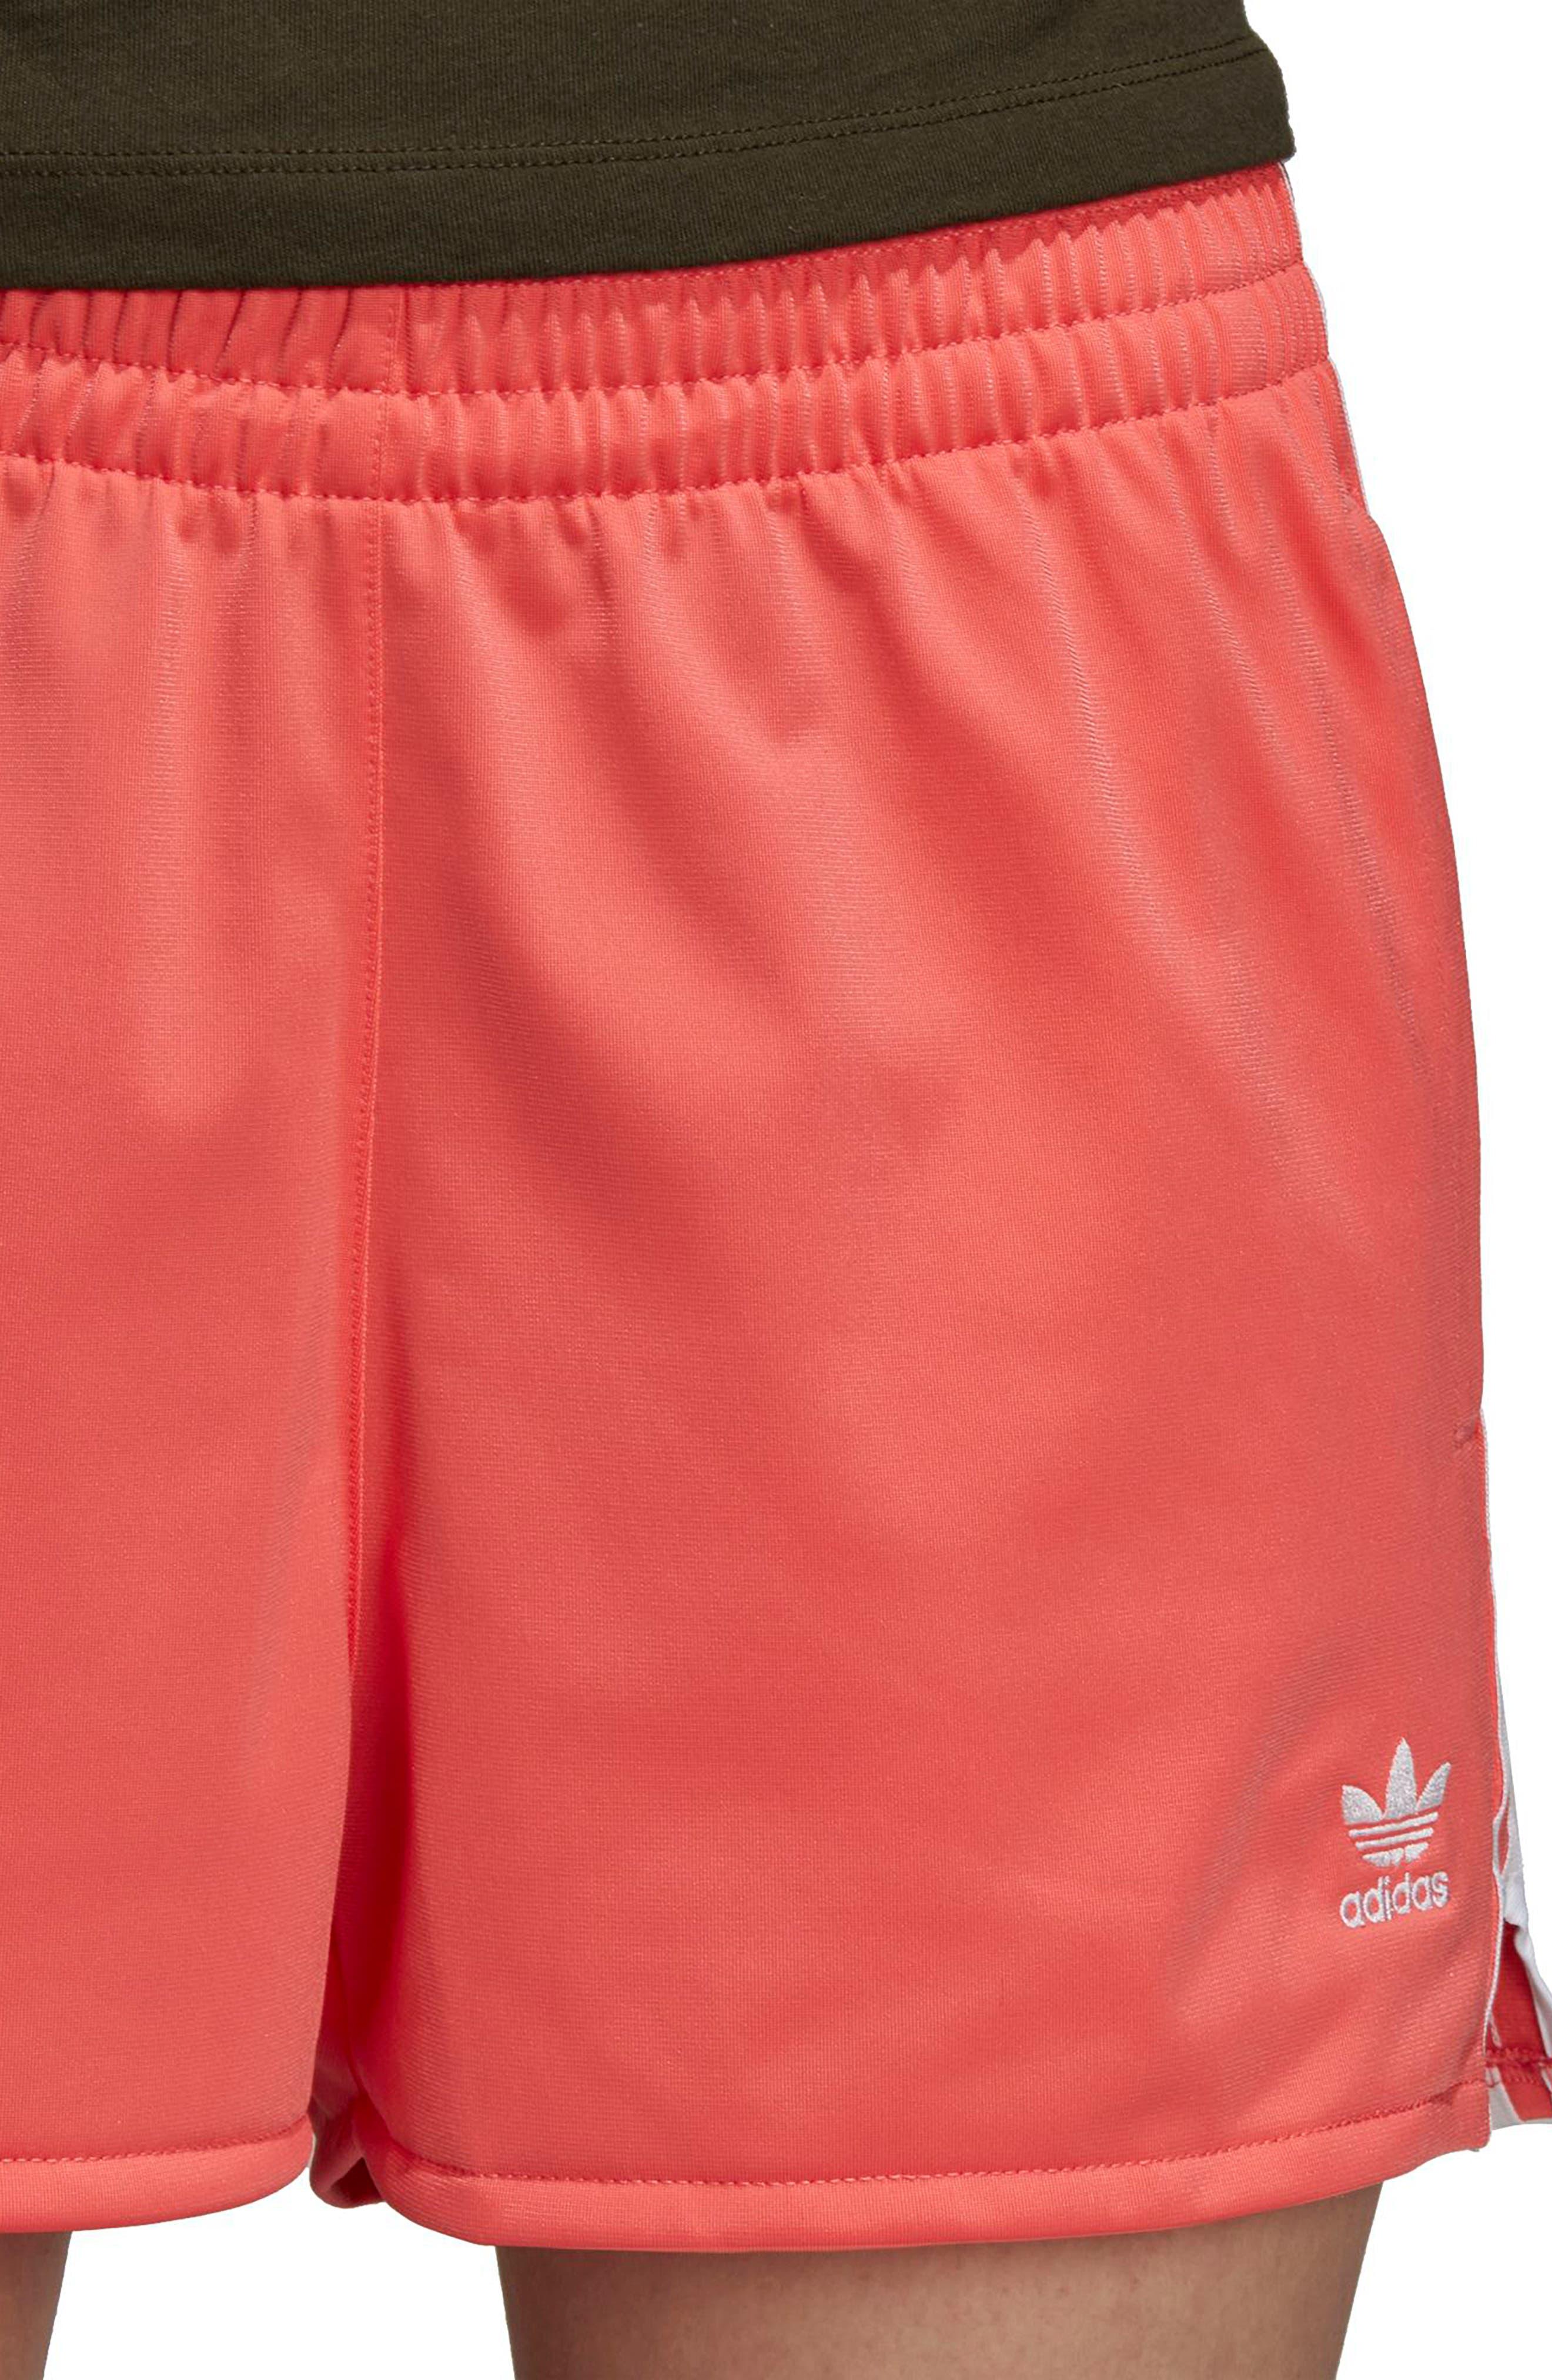 ADIDAS ORIGINALS,                             3-Stripes Shorts,                             Alternate thumbnail 8, color,                             600